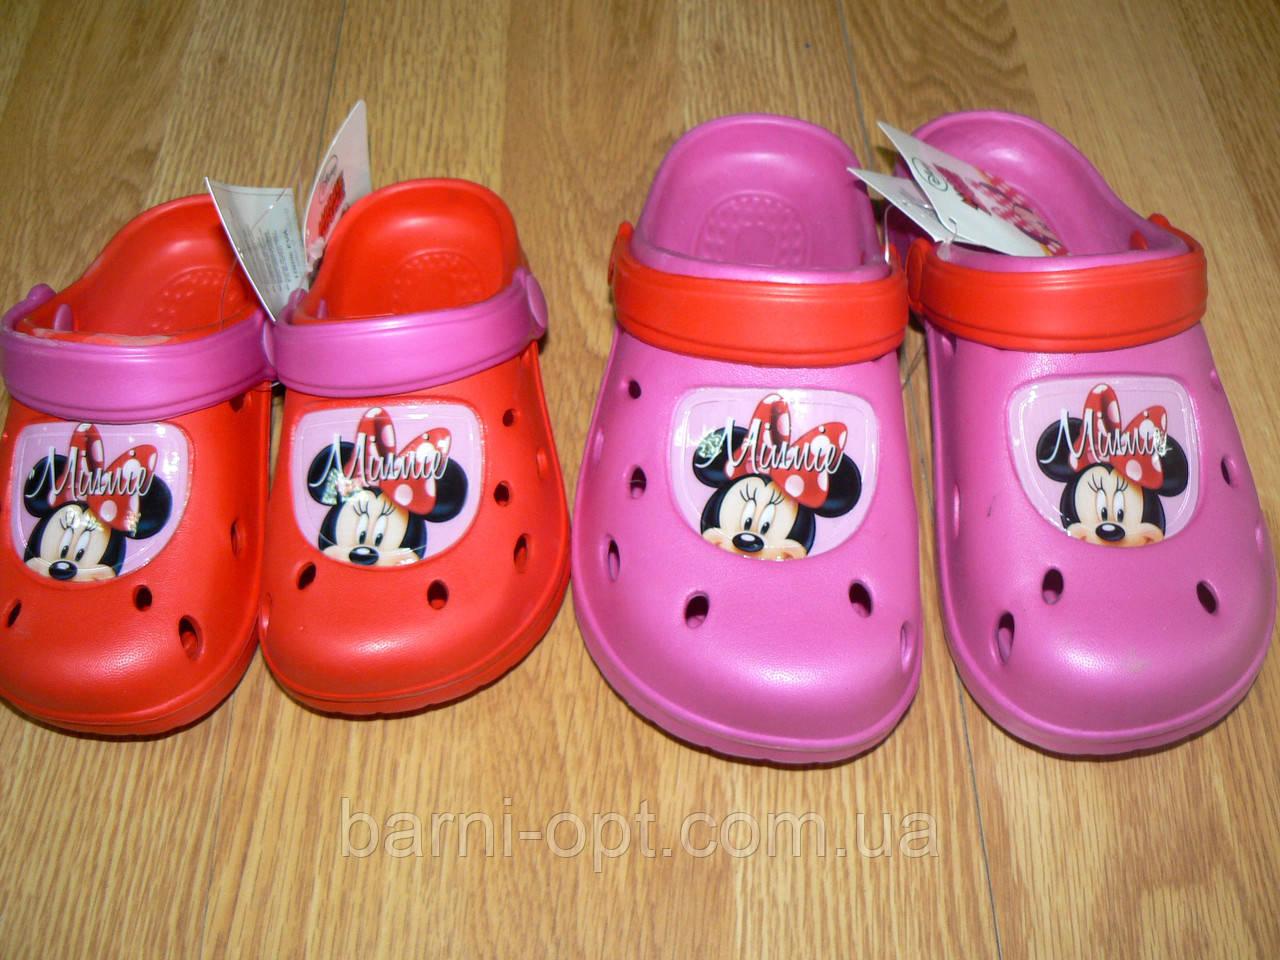 Шлепки детские, Disney, 23-34 рр